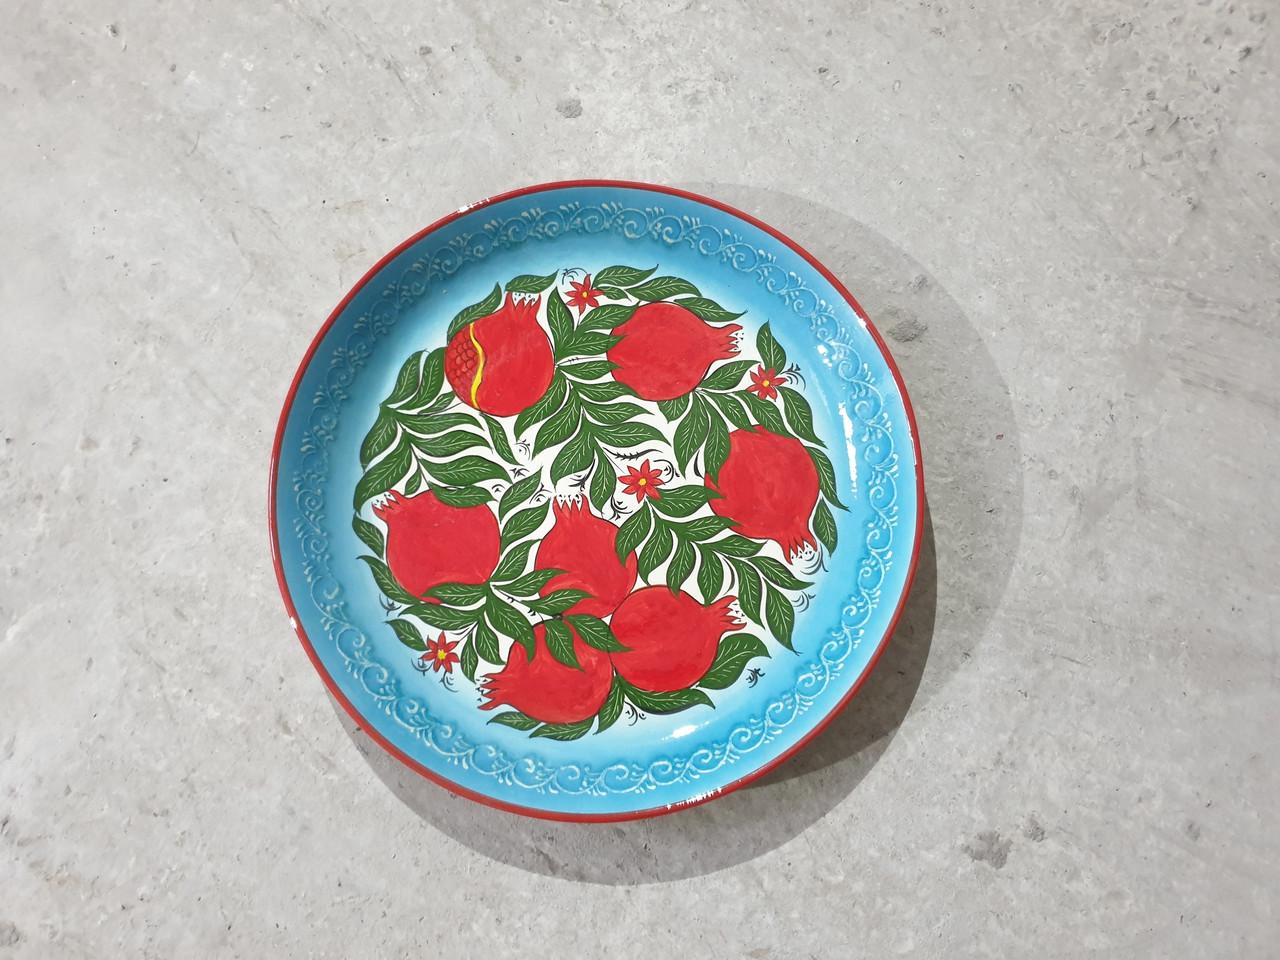 Узбекская посуда.  ляган для плова. риштан 38см